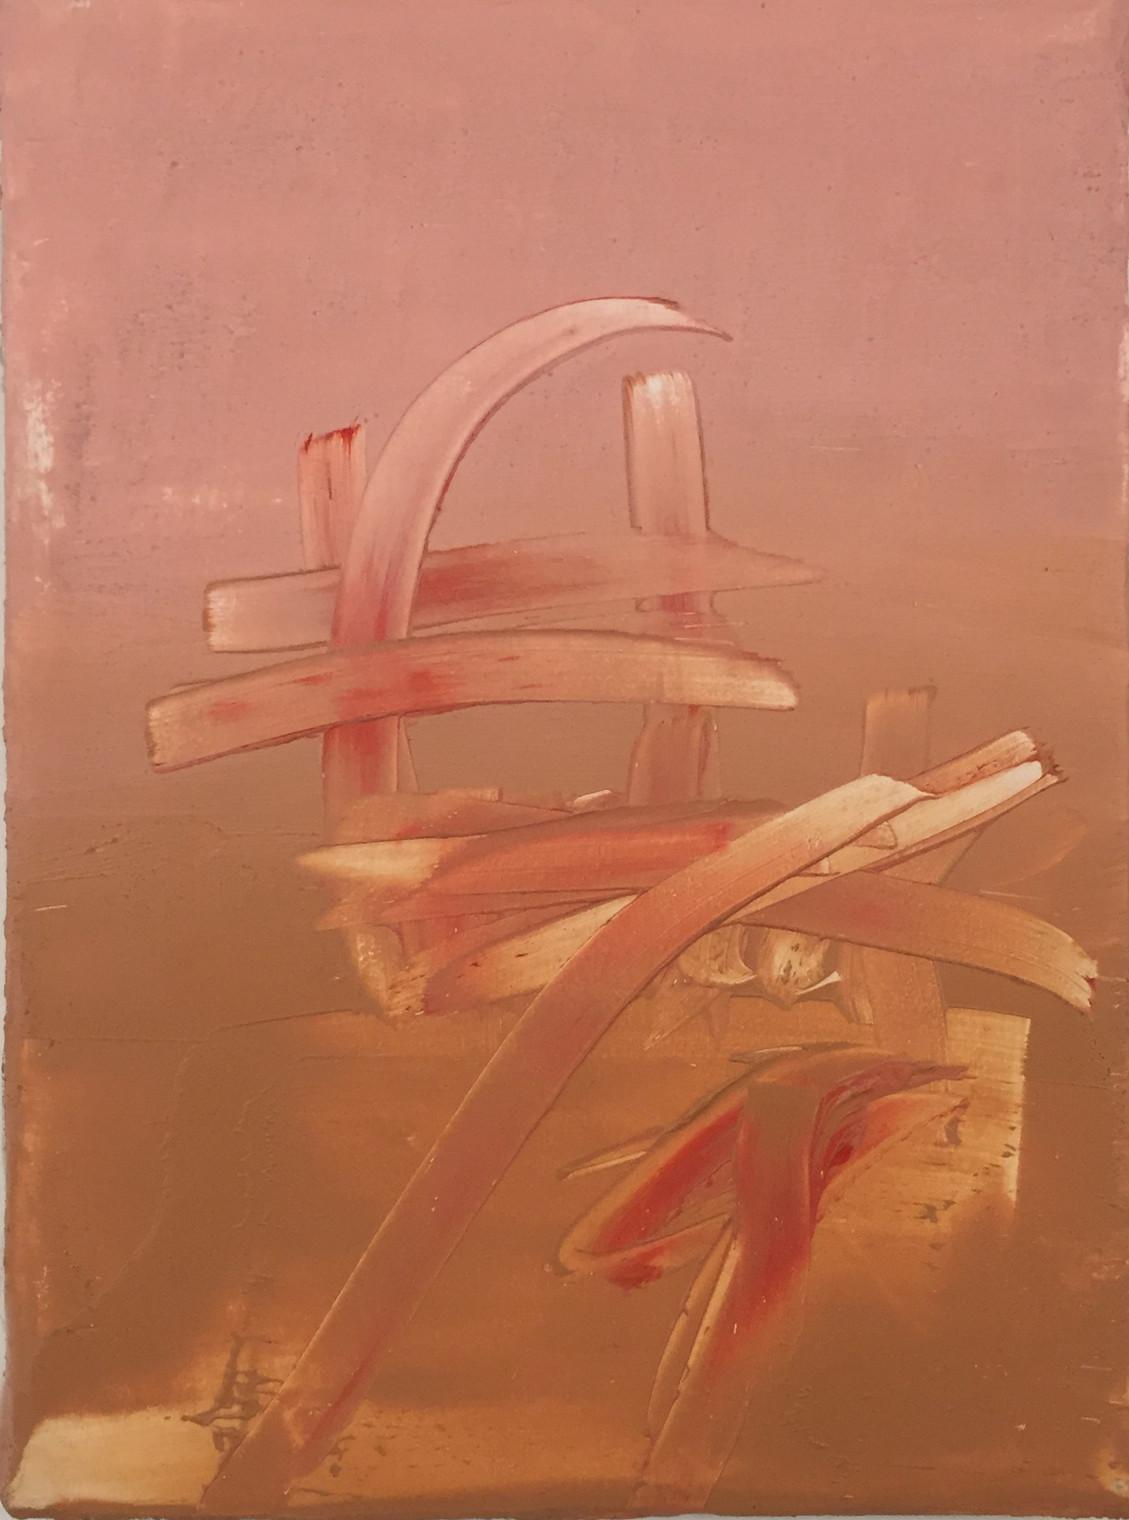 Fancy Lipstick, 2015 | Oil on canvas | 22 x 16 cm